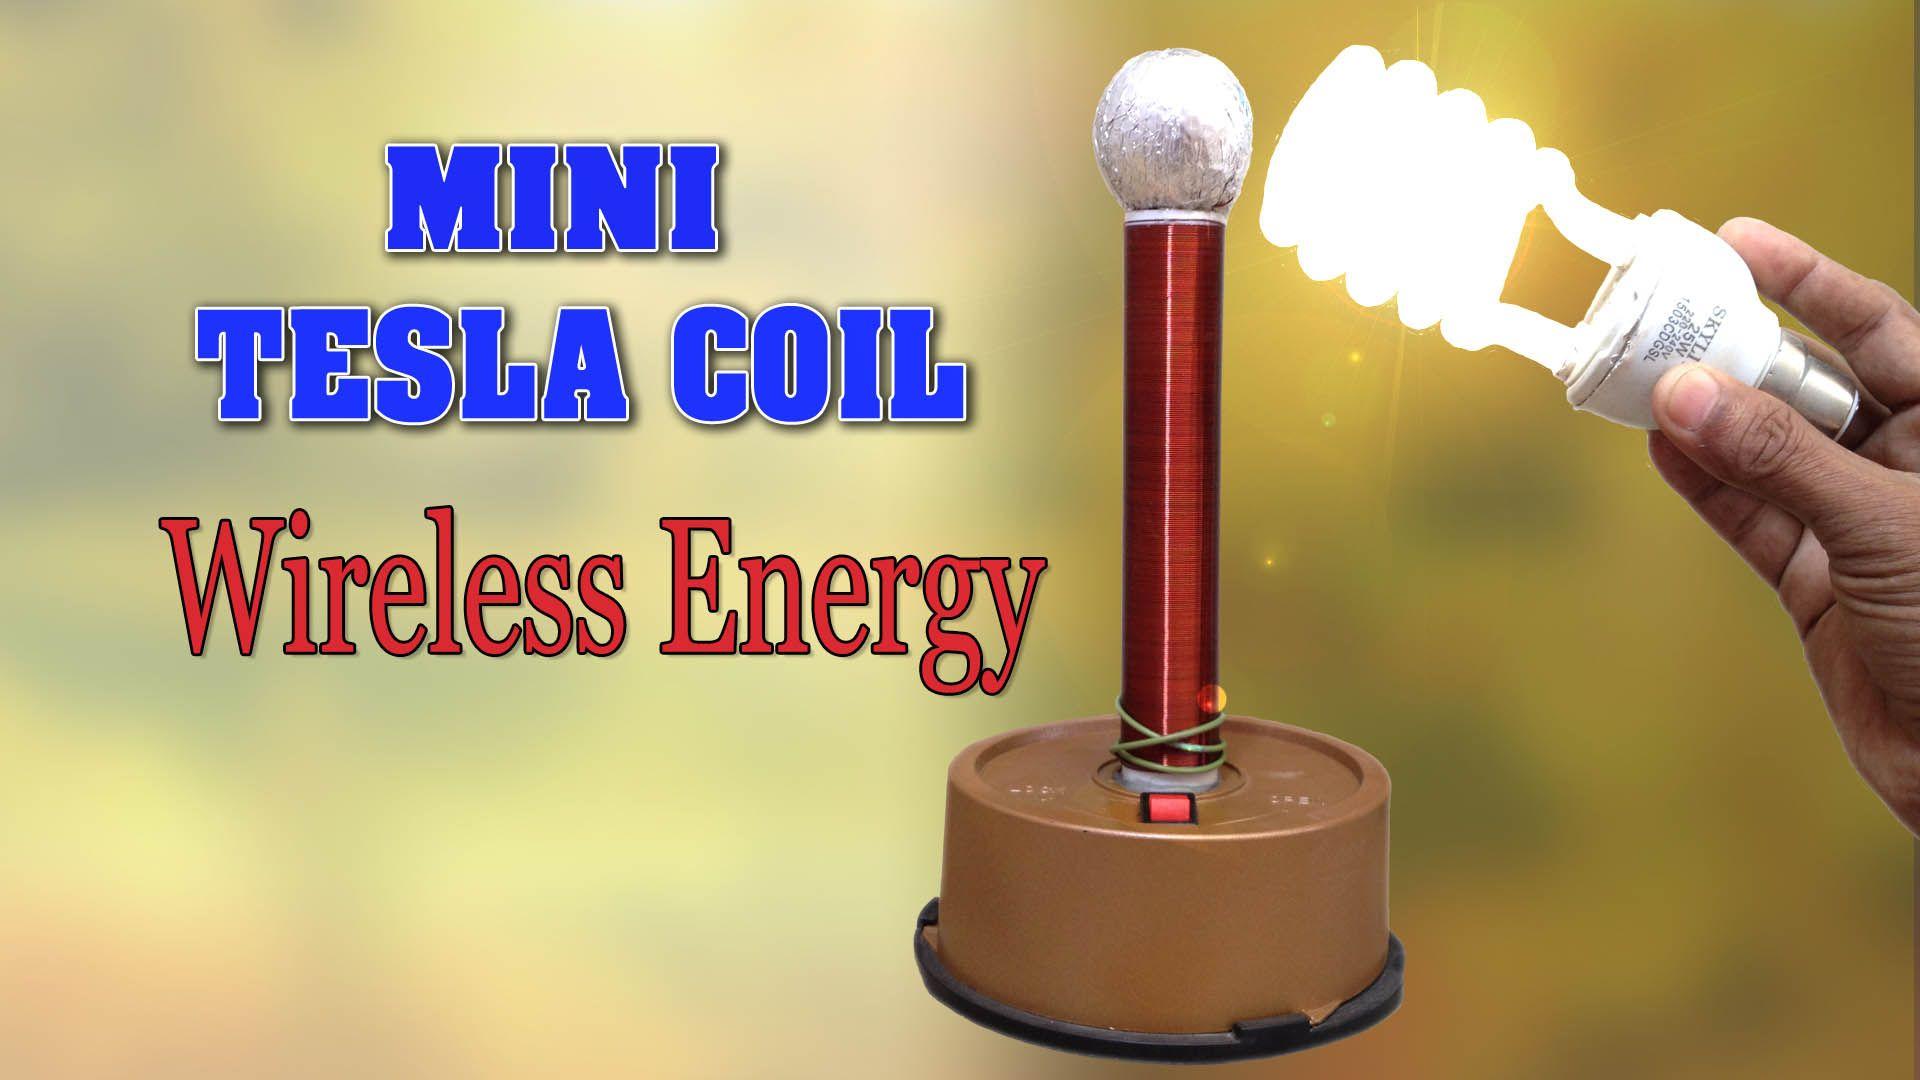 Mini Tesla Coil DIY Homemade Wireless Energy - TRONICSpro ...